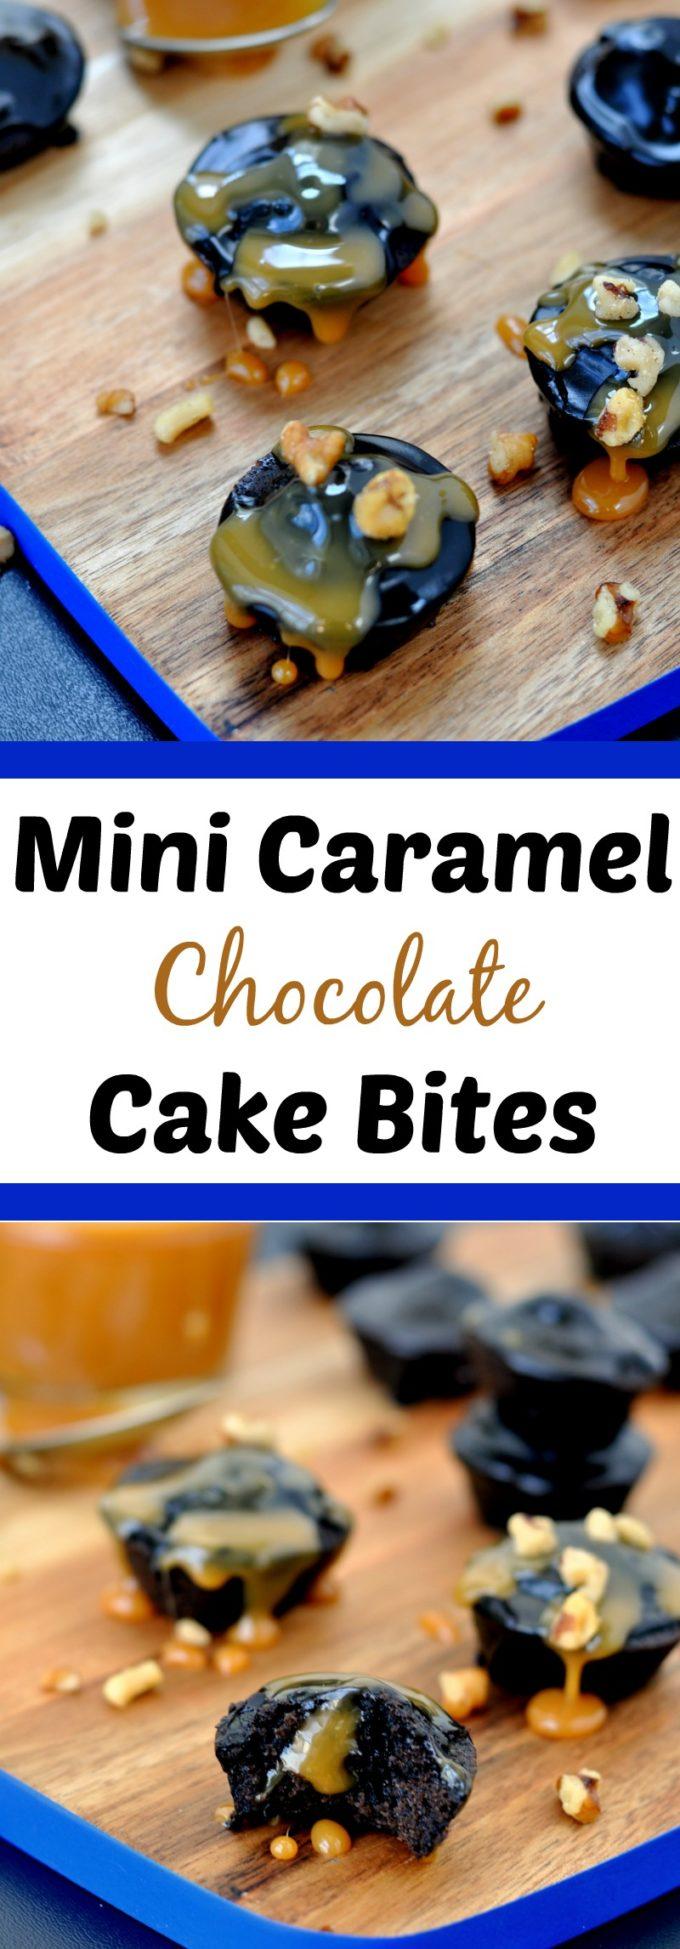 06 - mini-caramel-chocolate-cake-bites-pin